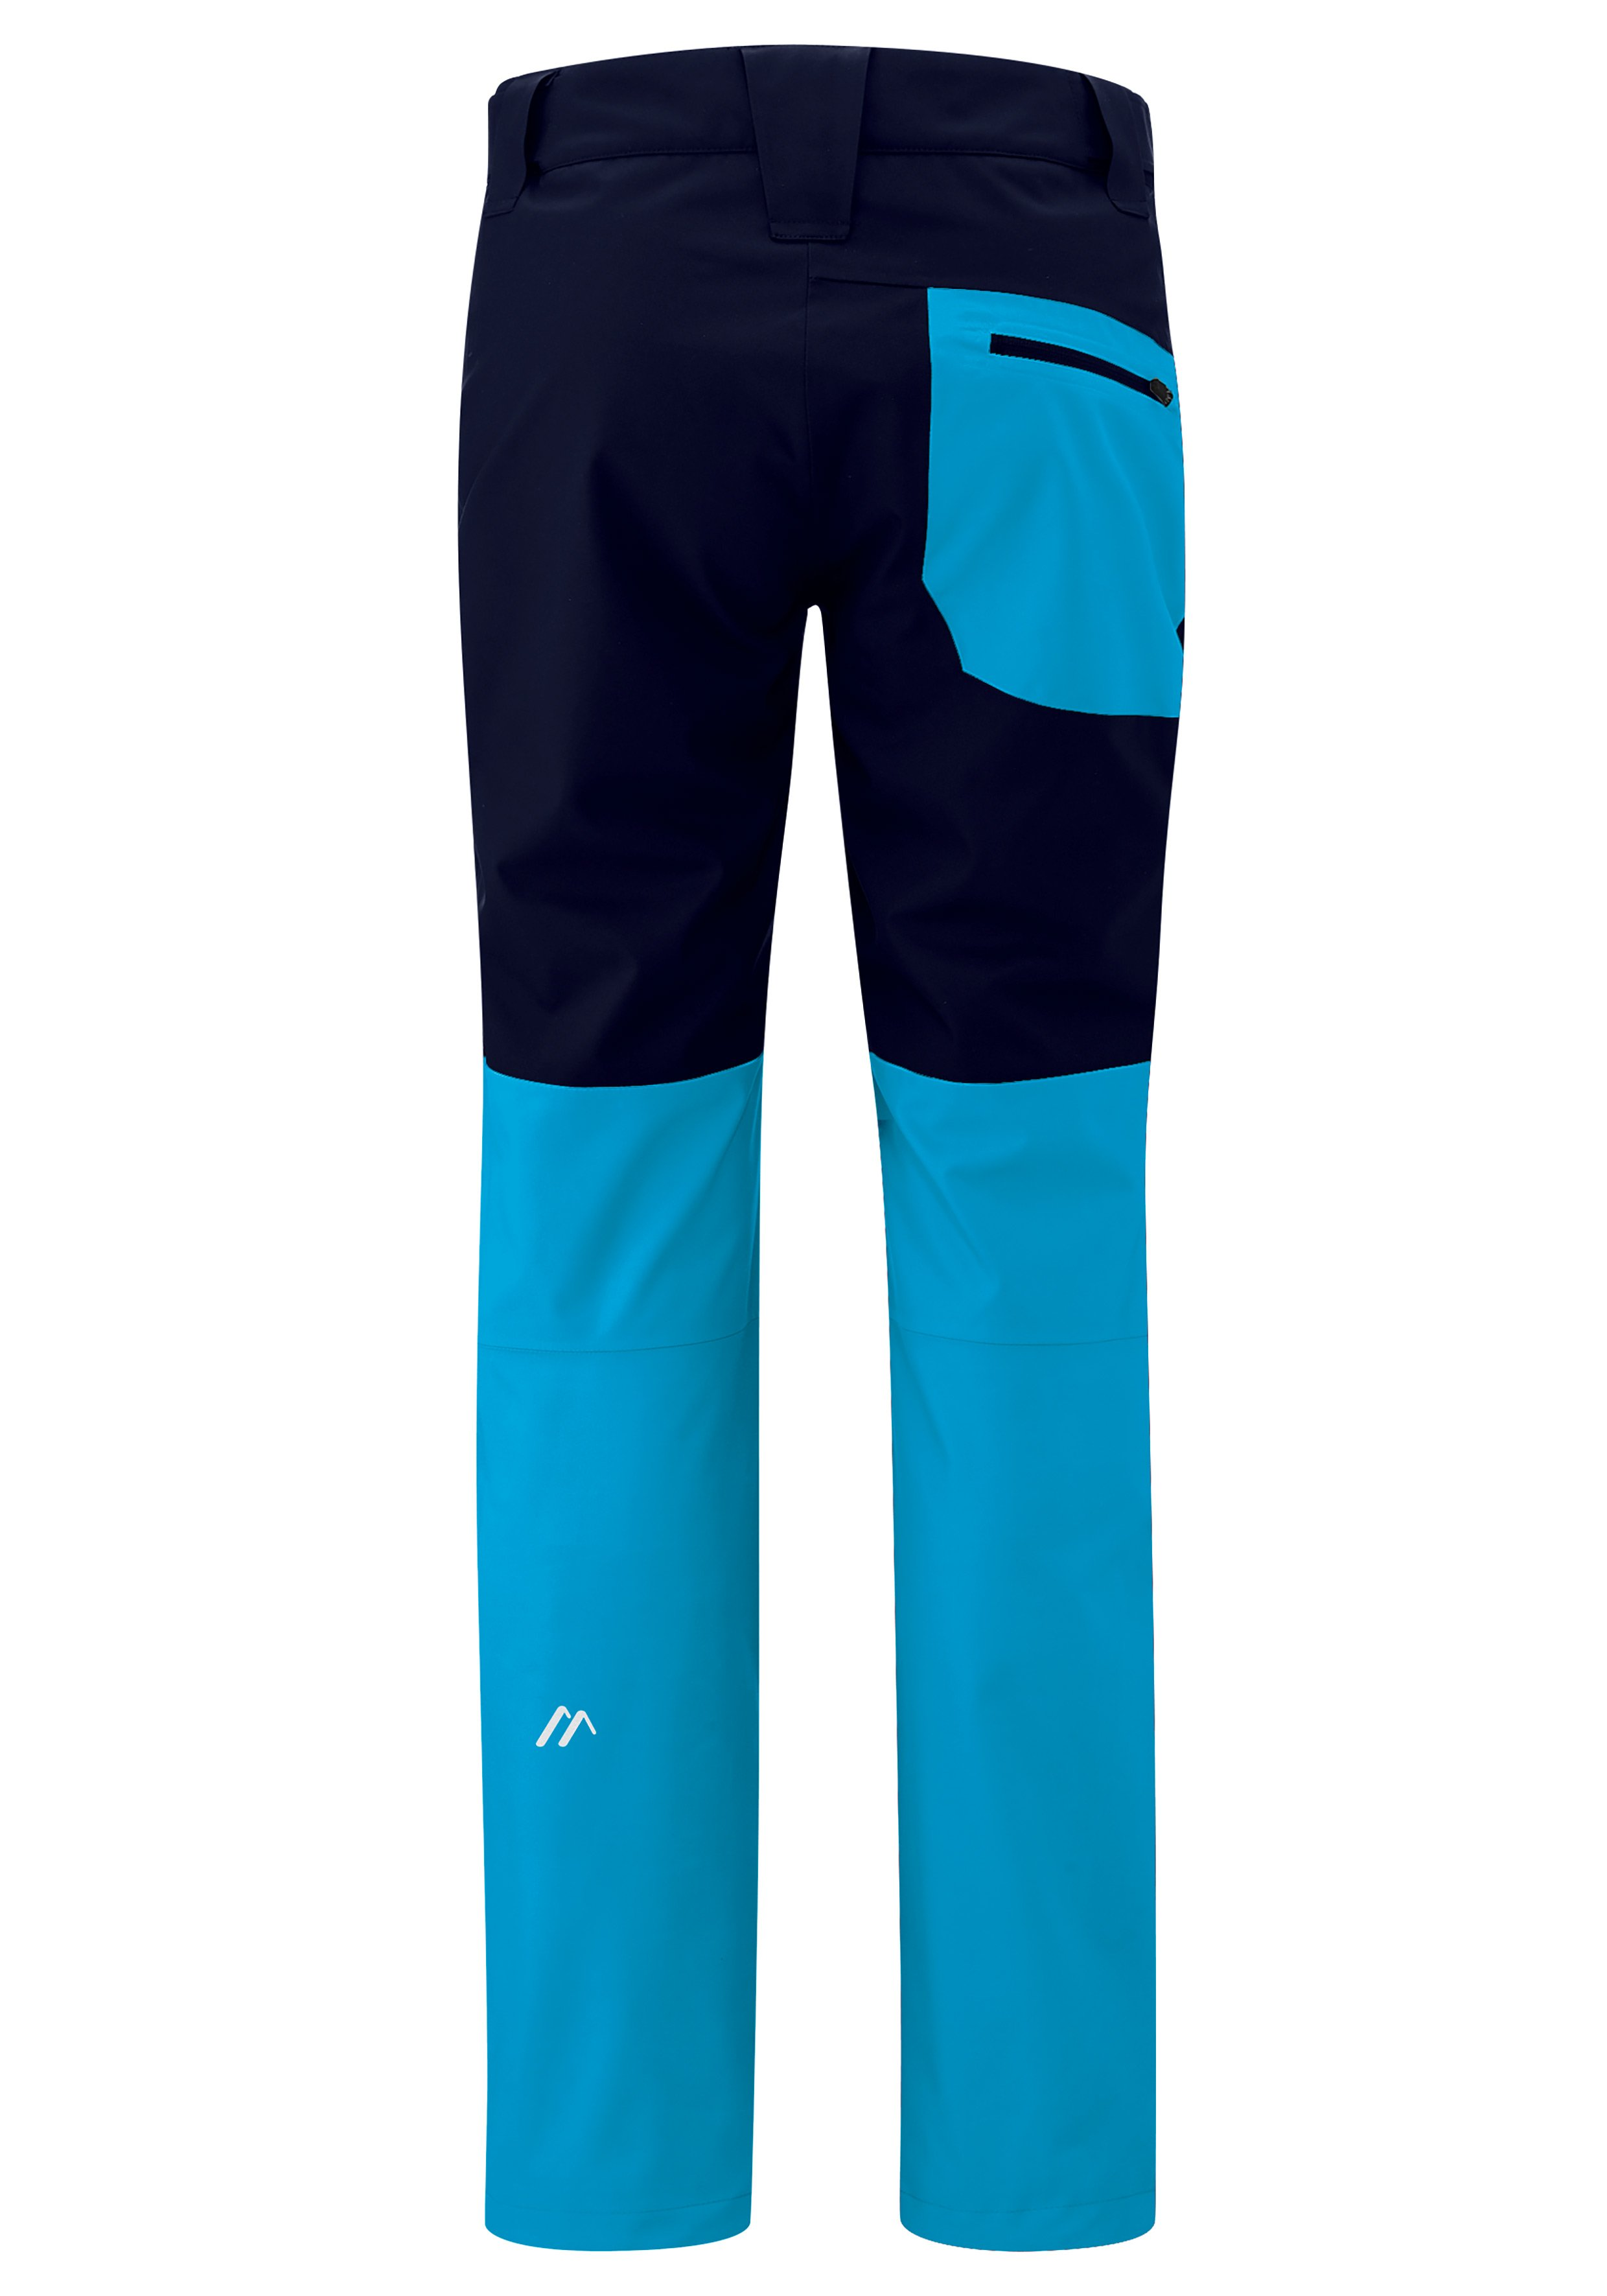 Maier Sports Funktionshose Diabas W | Sportbekleidung > Sporthosen > Sonstige Sporthosen | maier sports